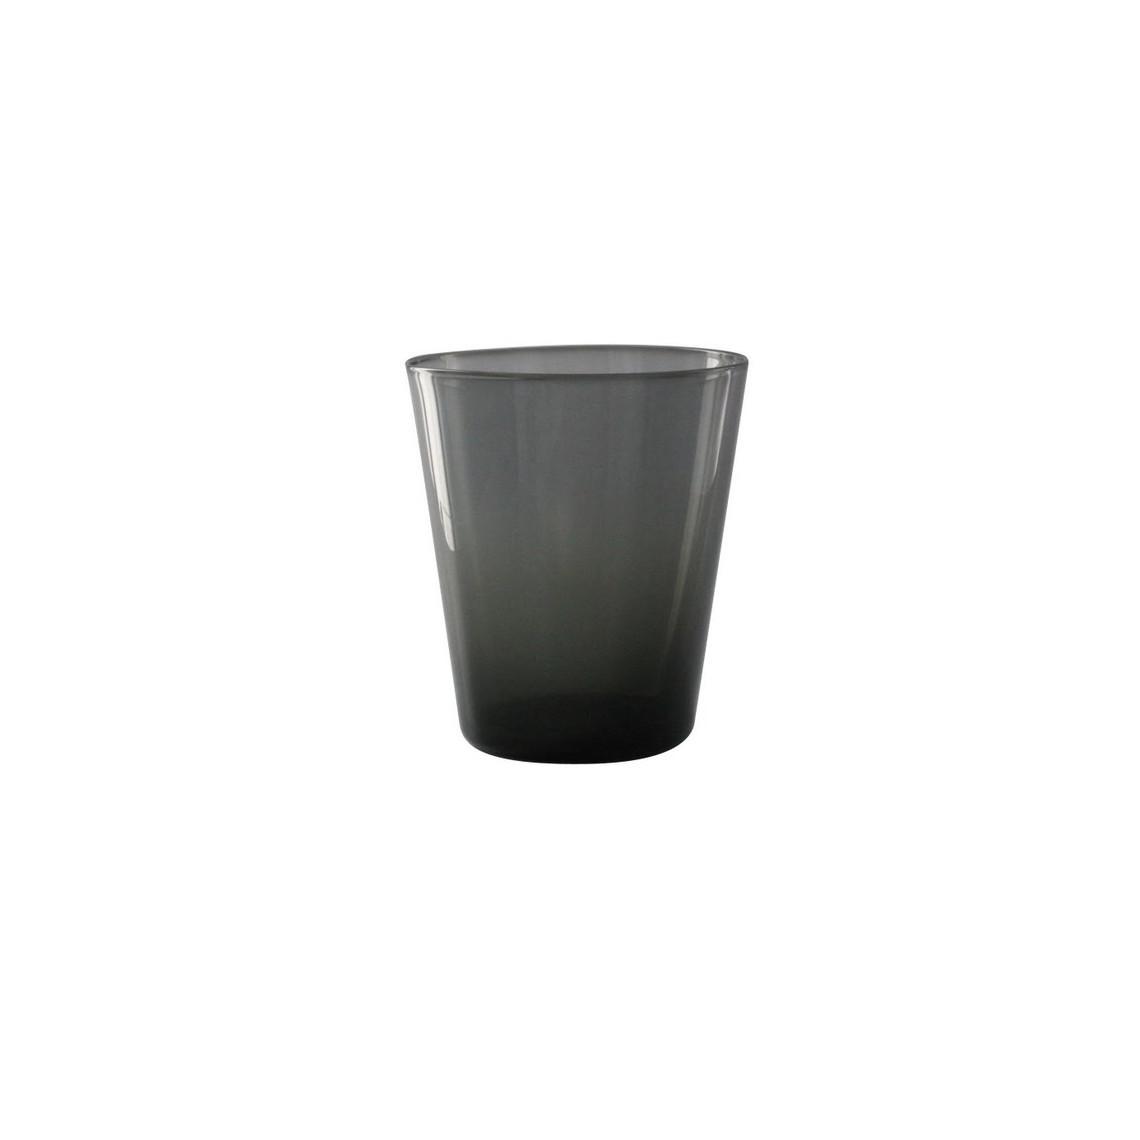 Gobelet Papageno gris fumé (34 cl)